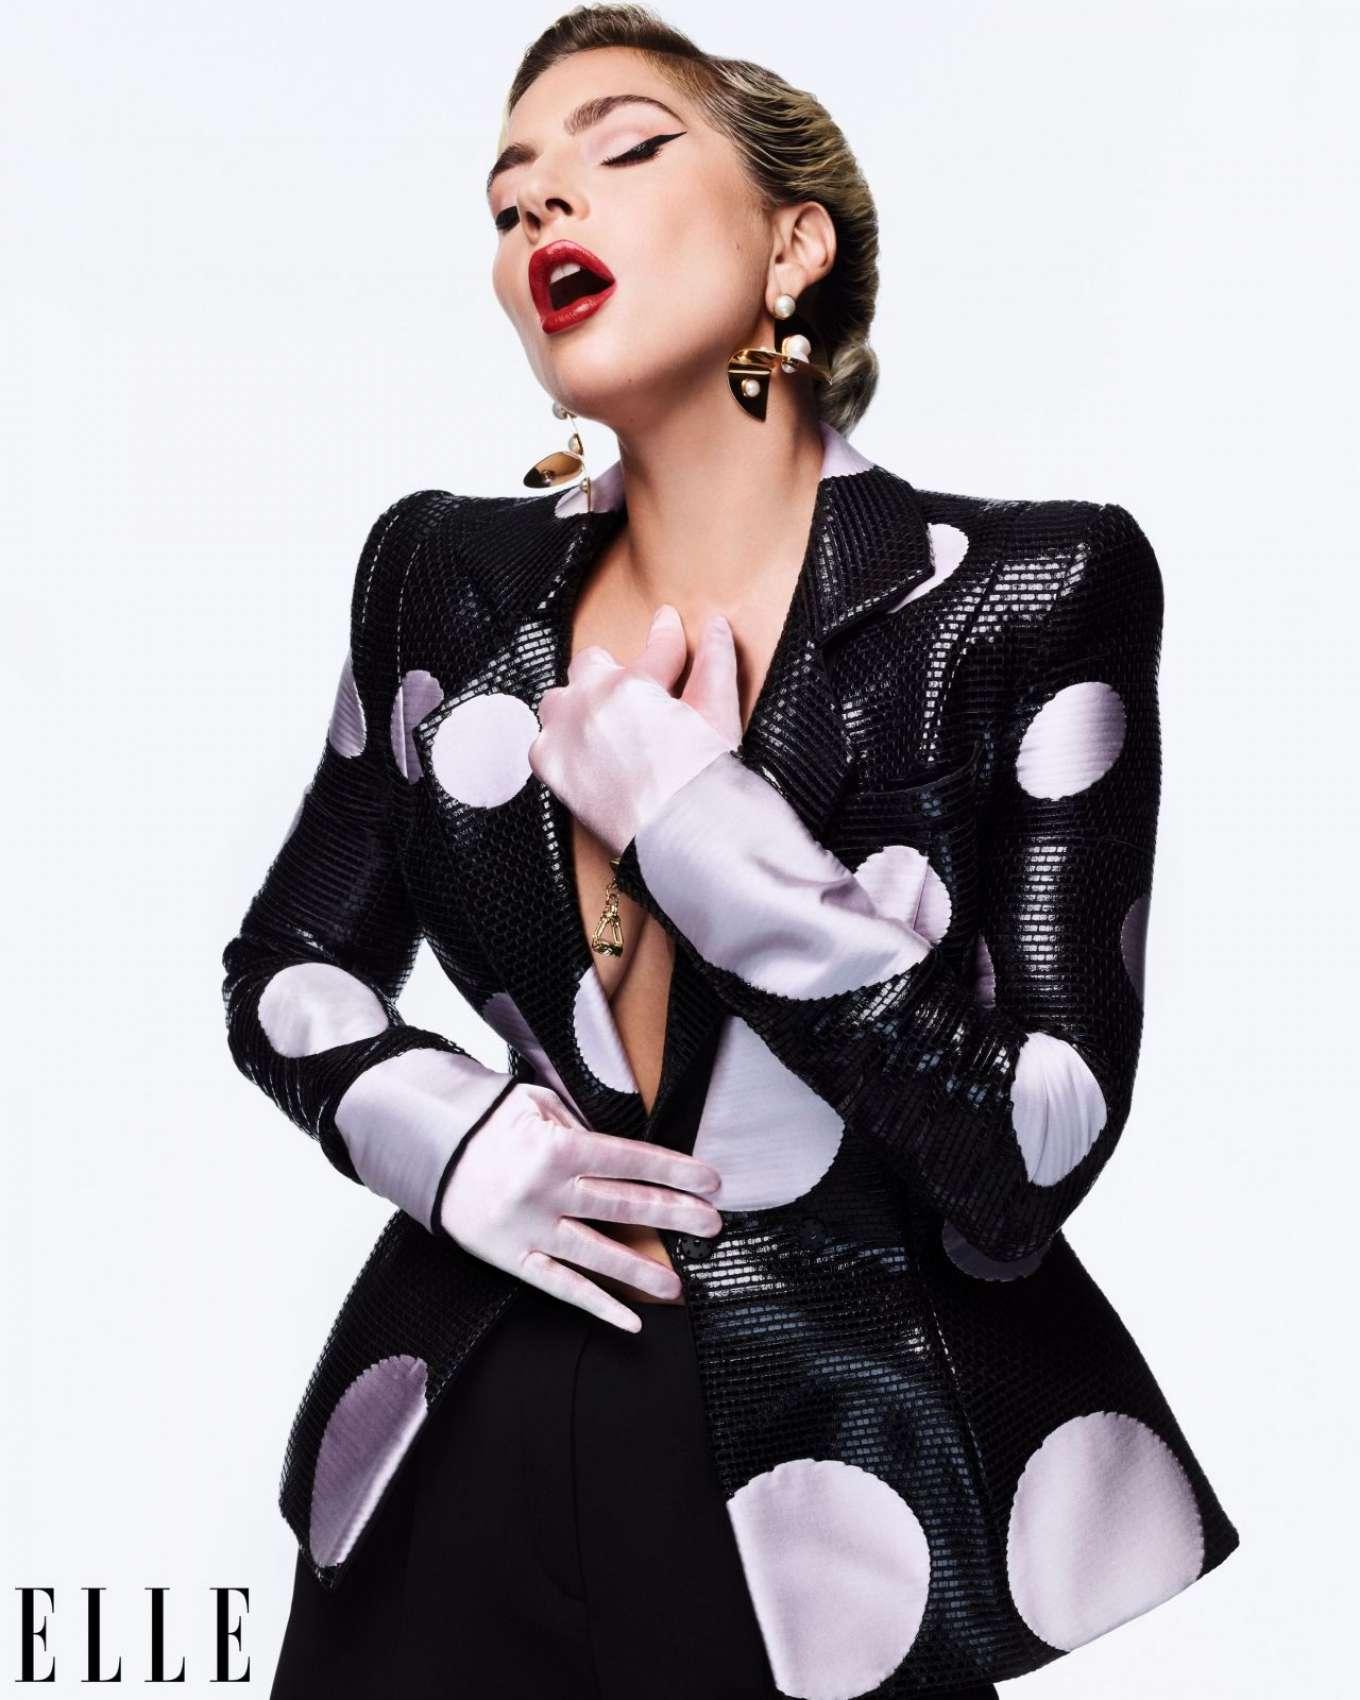 Lady Gaga - ELLE Magazine (December 2019)